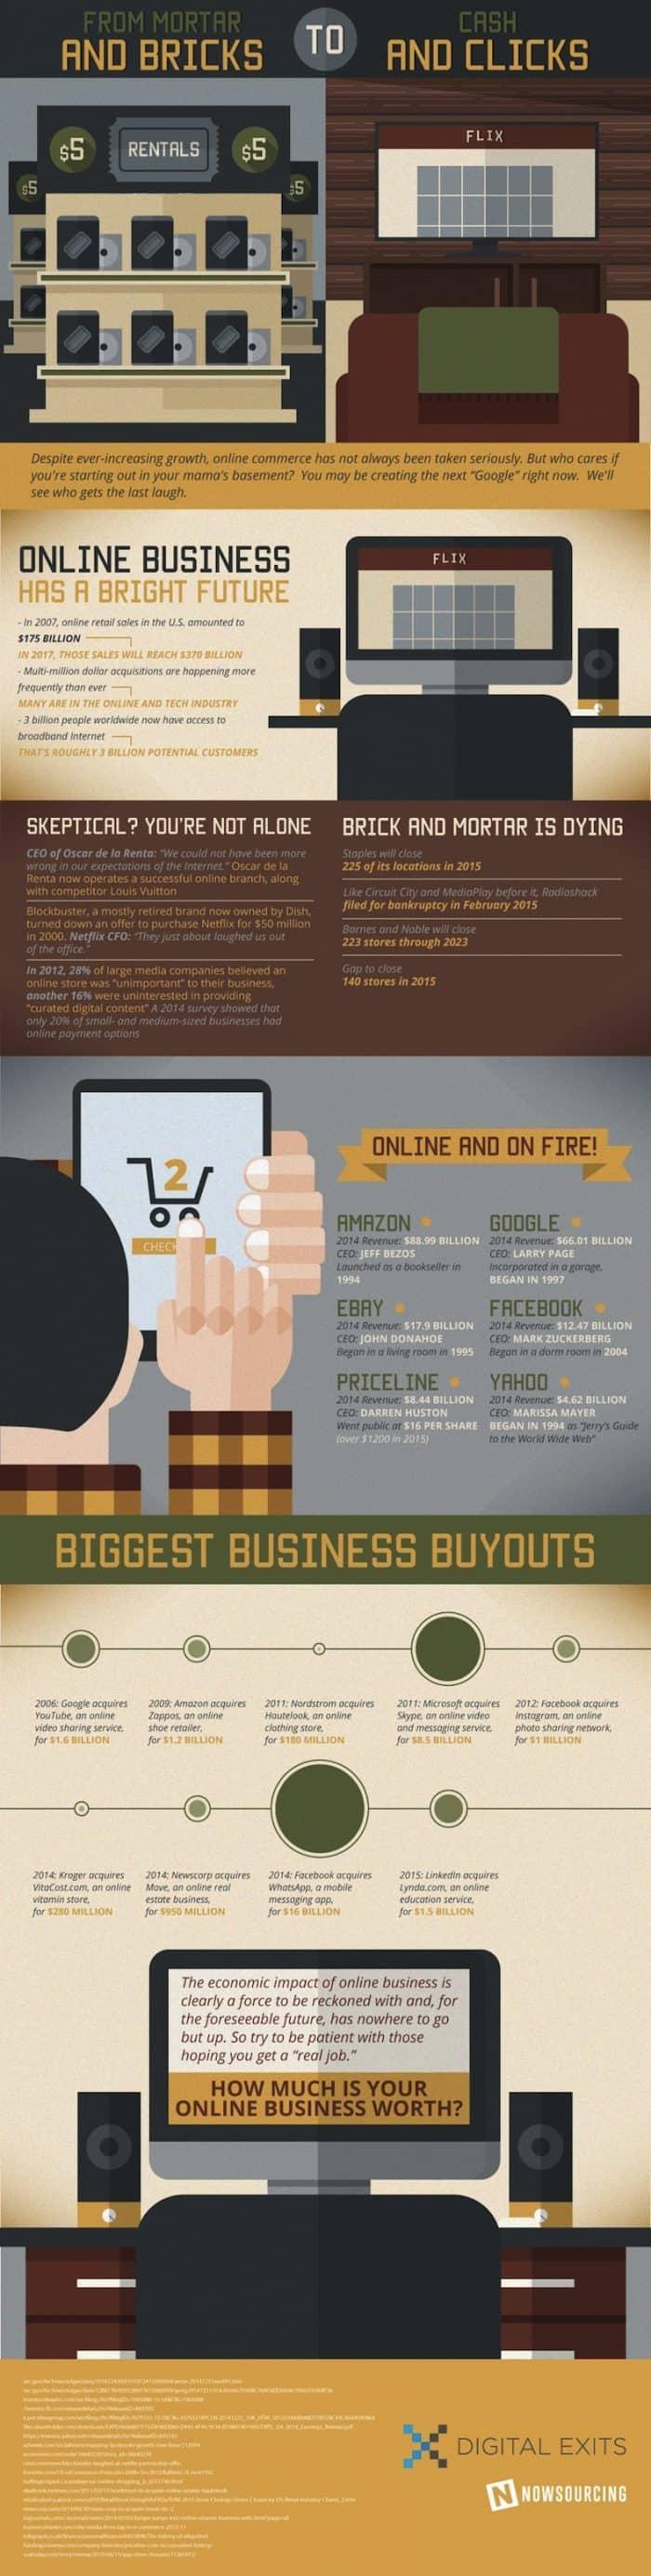 Online Commerce Infographic